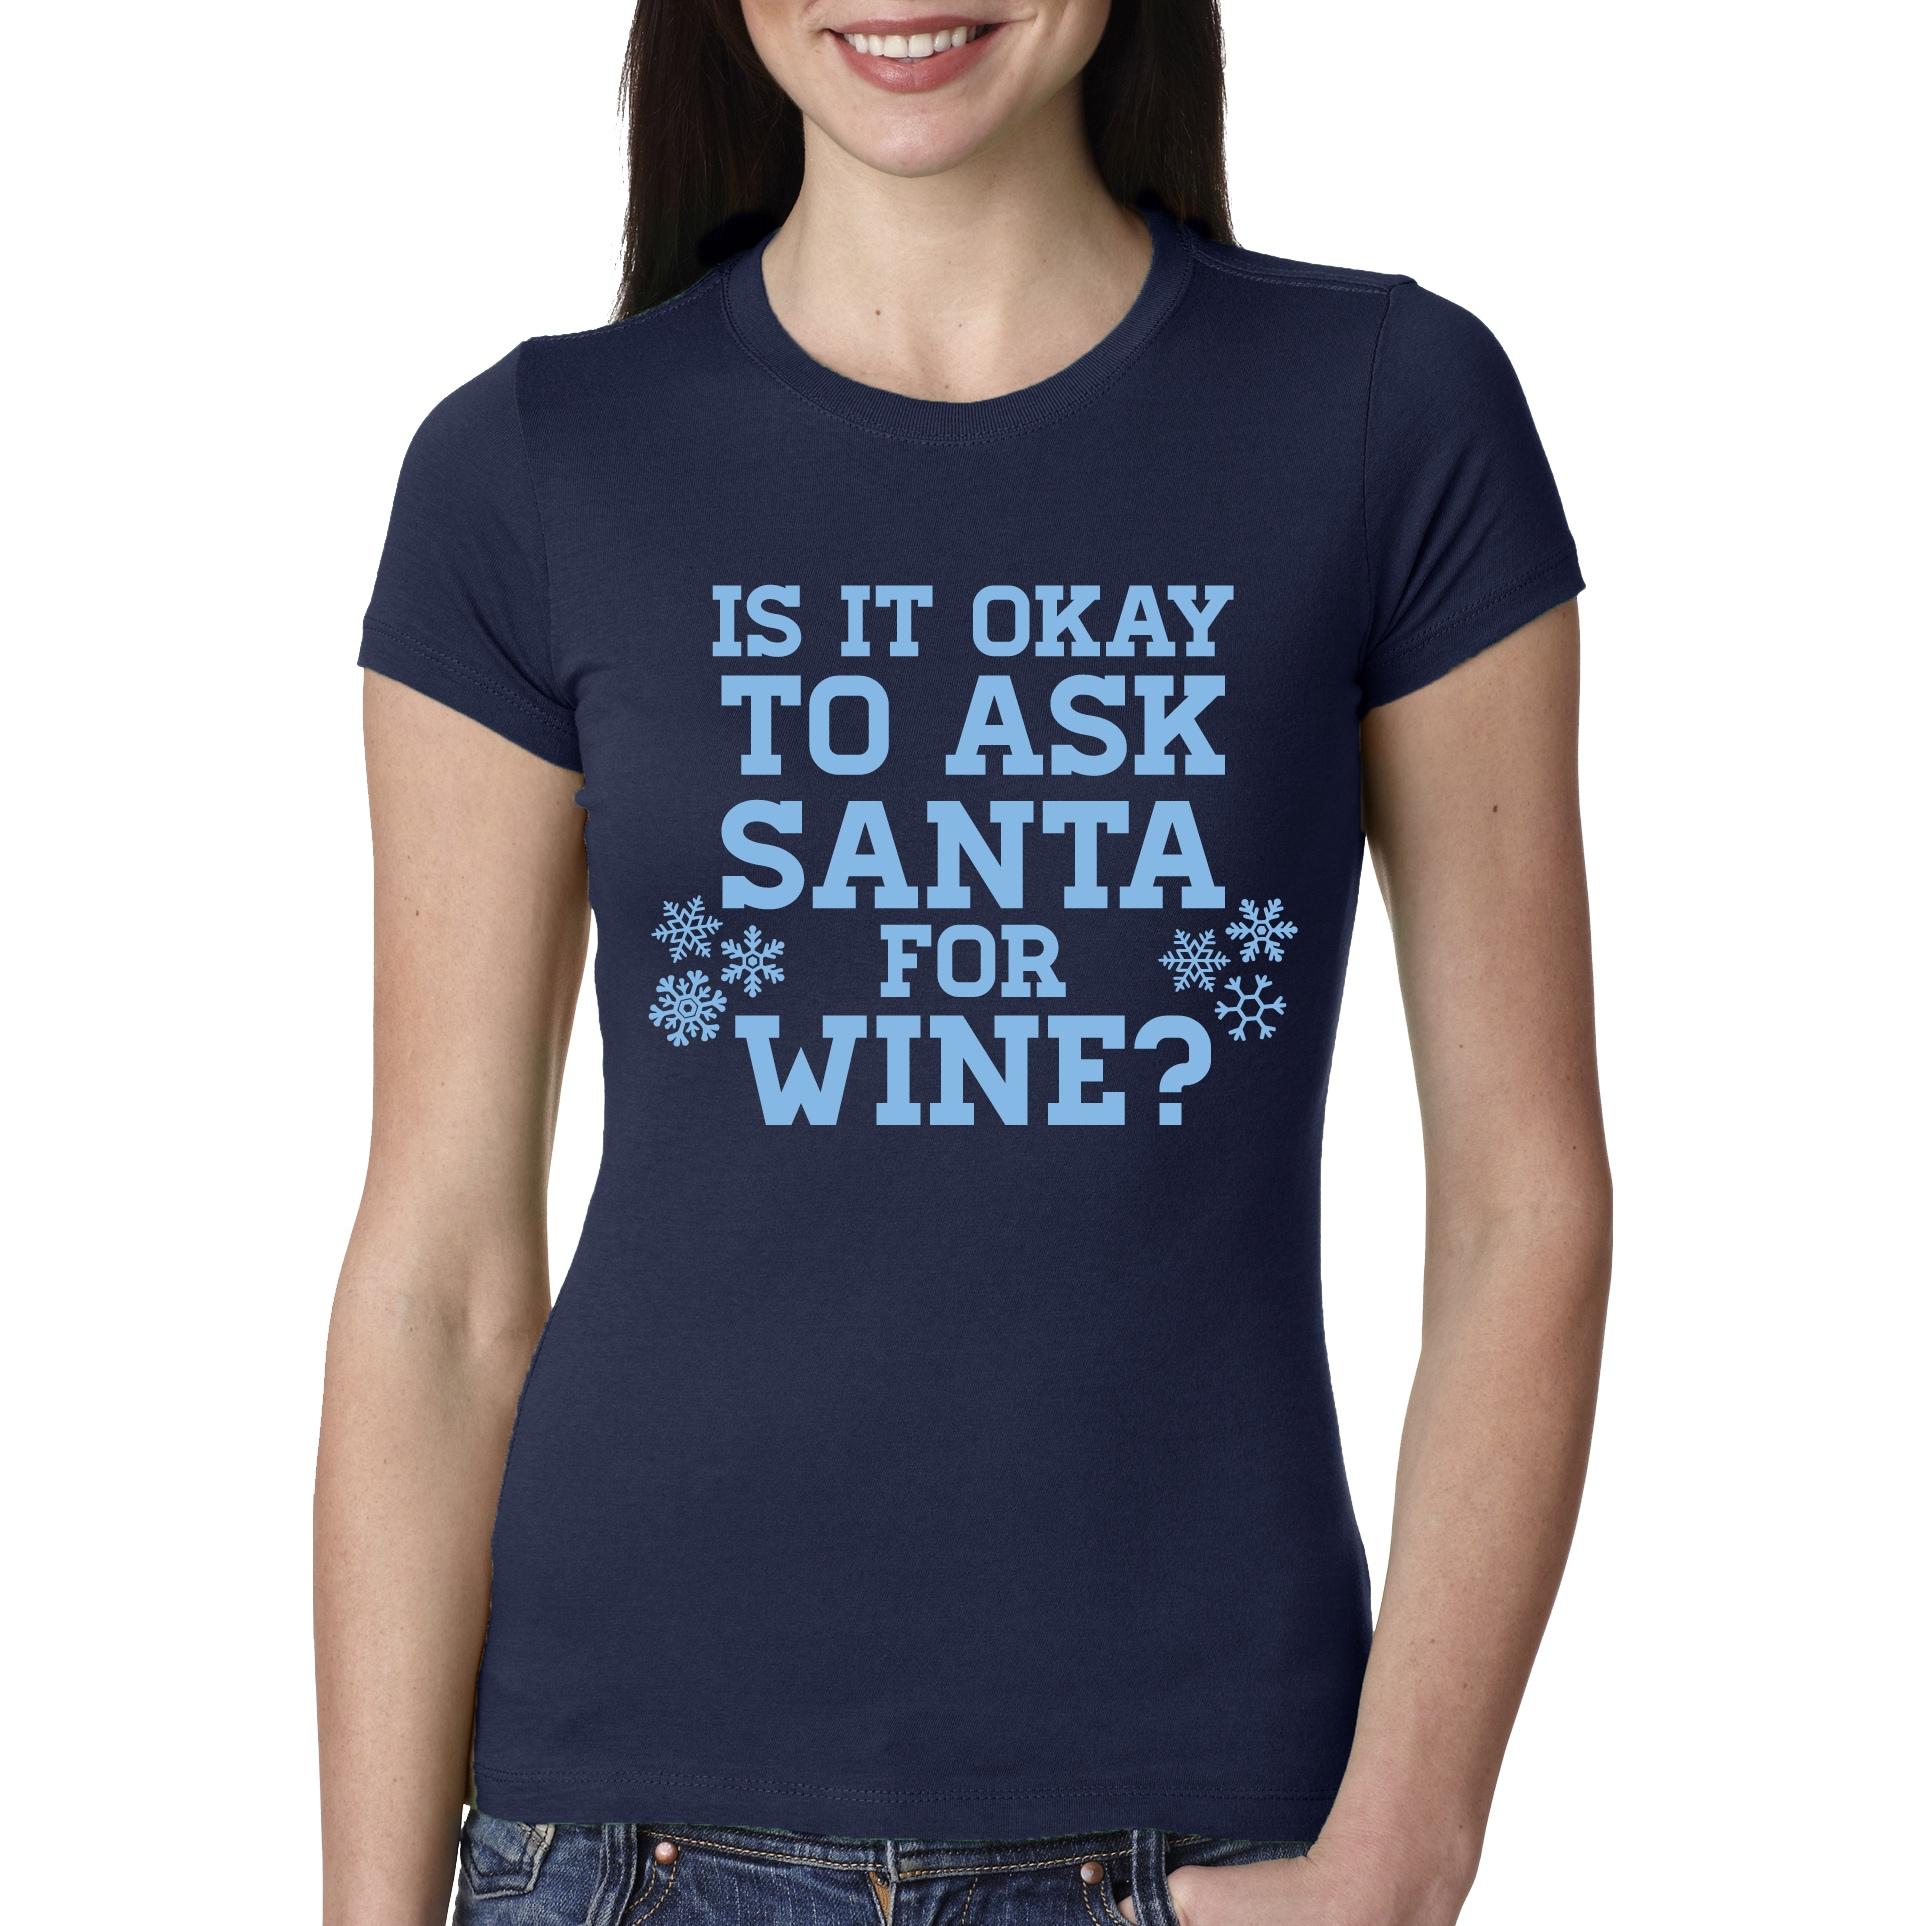 Crazy Dog Women's 'Ask Santa For Wine' Navy (Blue) Cotton...